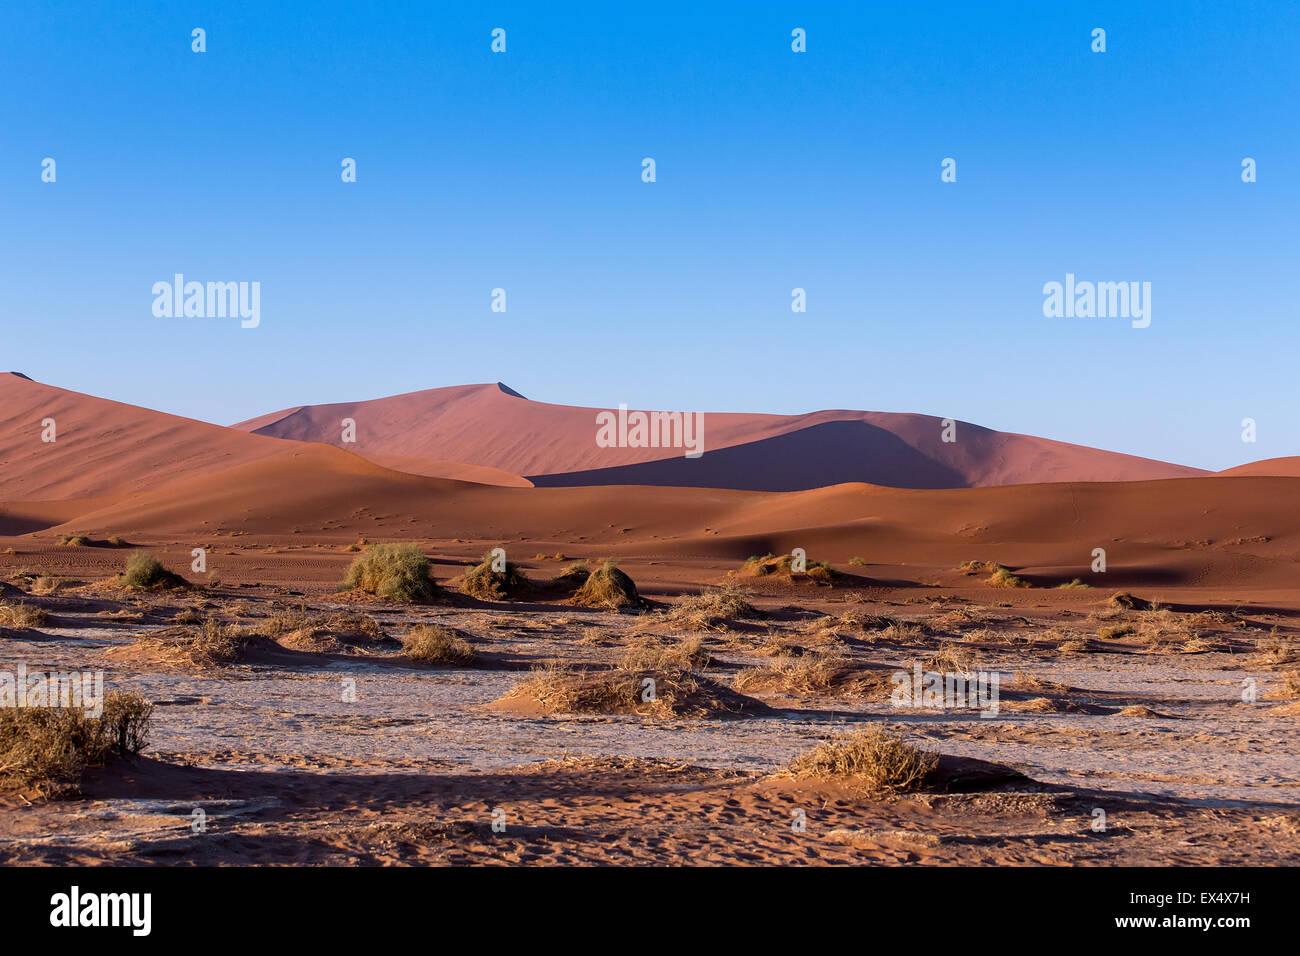 beautiful sunrise landscape of hidden Dead Vlei in Namib desert, best place of Namibia Stock Photo